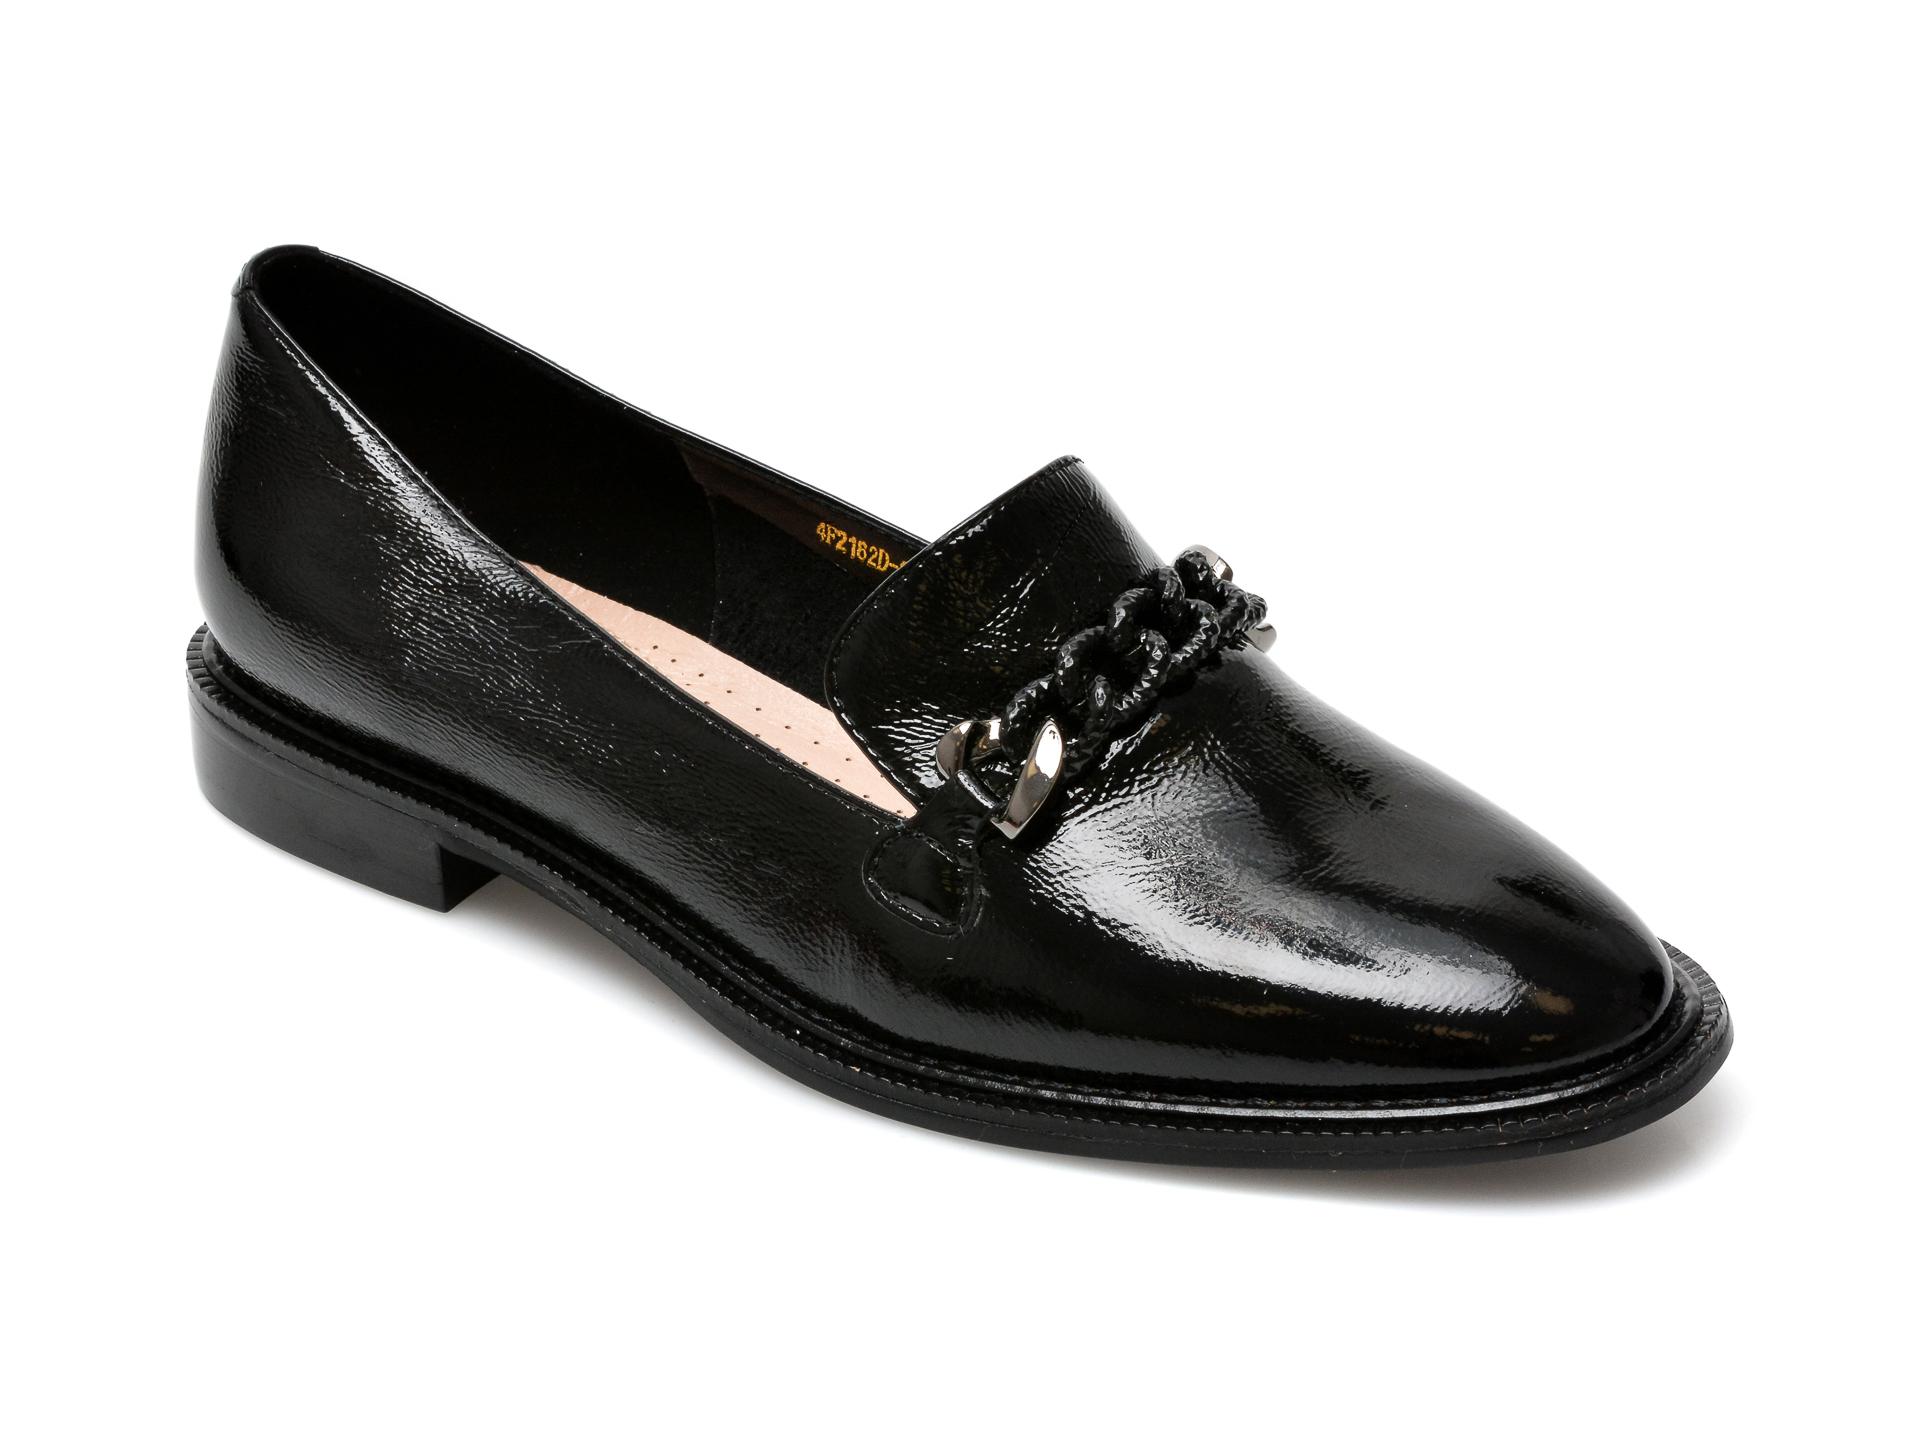 Pantofi EPICA negri, 4F202A9, din piele naturala lacuita imagine otter.ro 2021